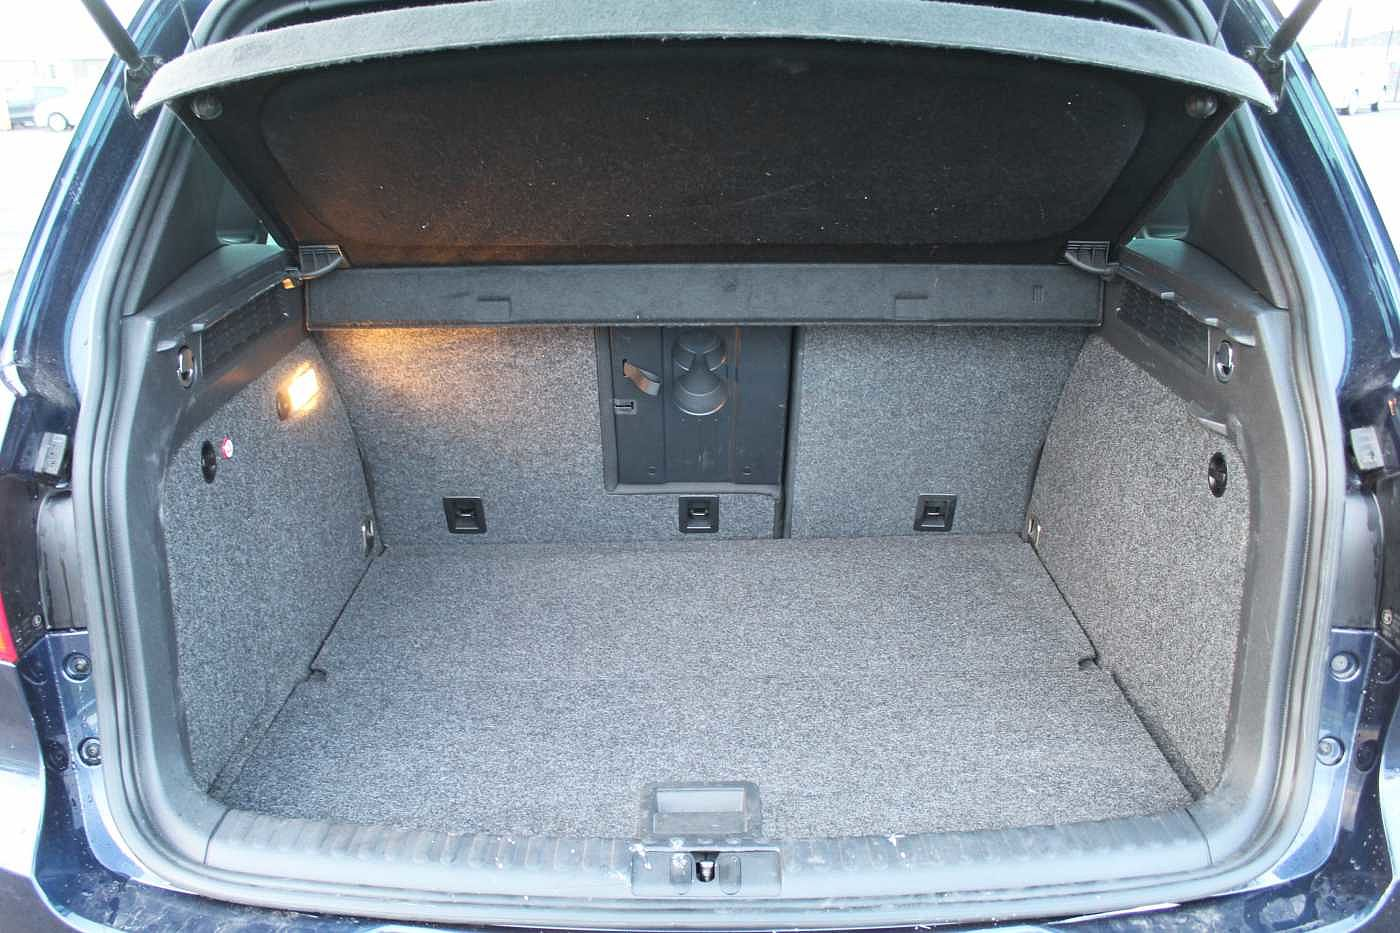 Volkswagen Tiguan 2.0TDI 150 RLine BlueMotion 4Motion SCR DSG